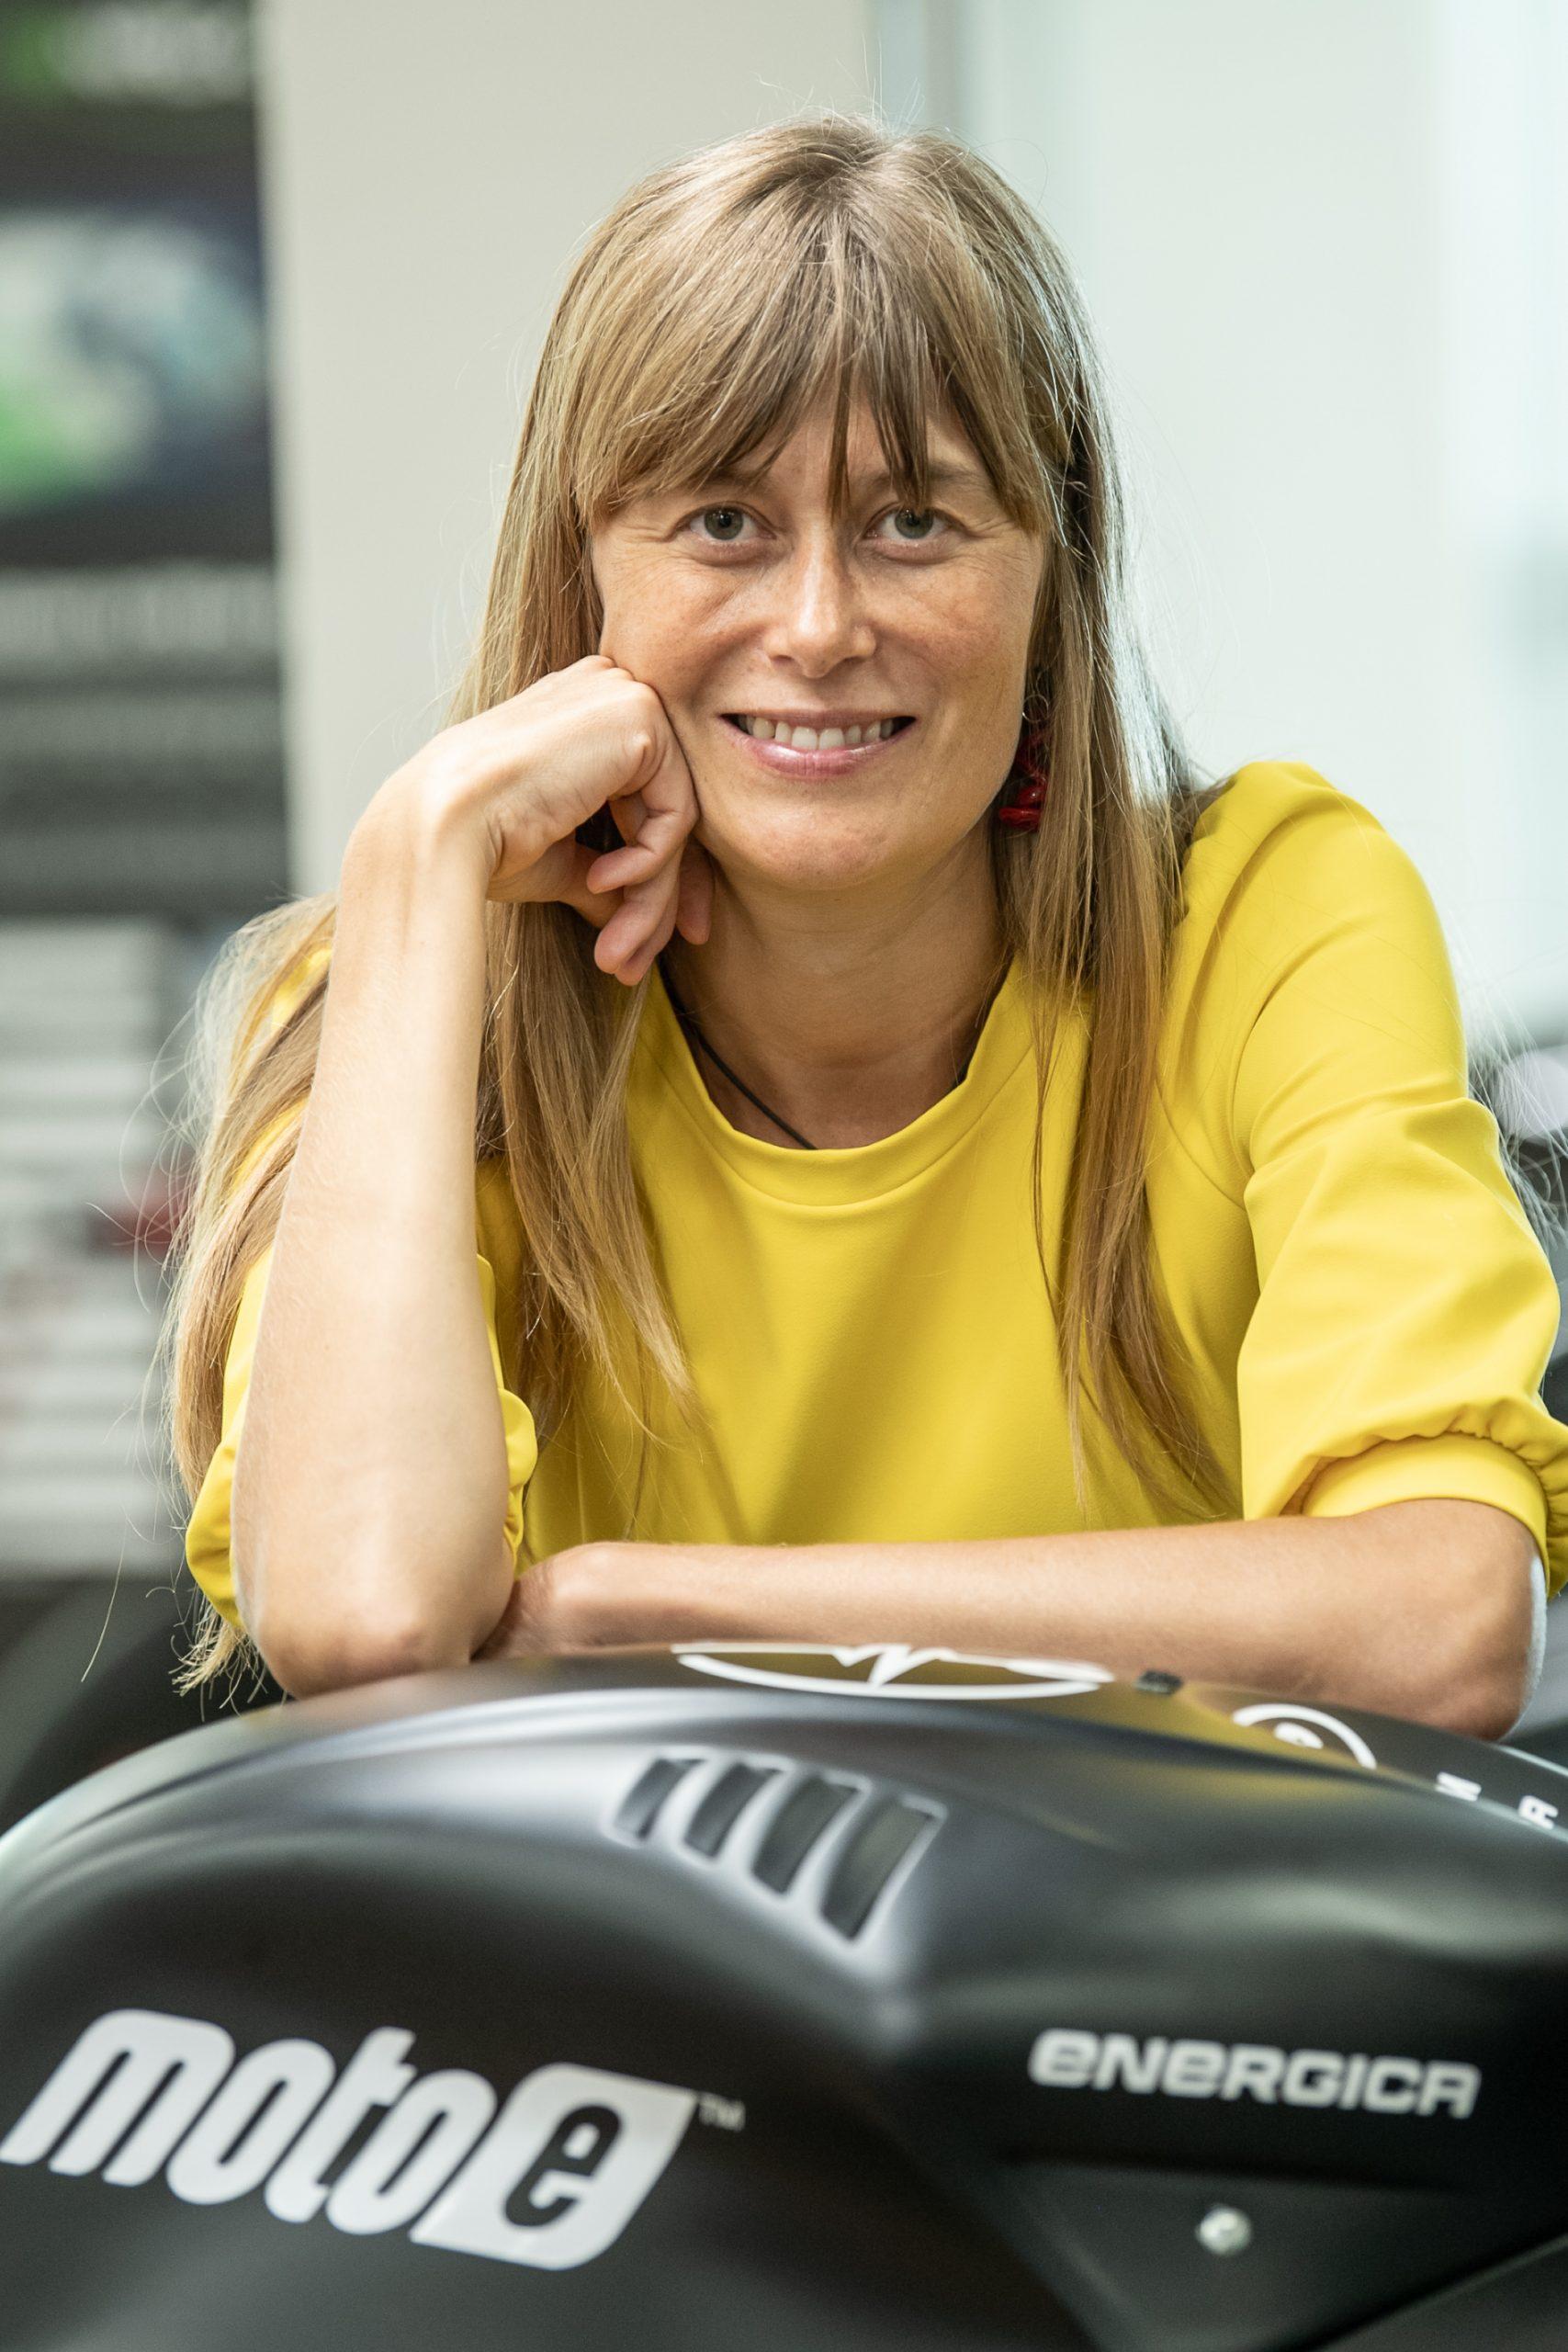 Livia Cevolini, CEO Energica Motor Company